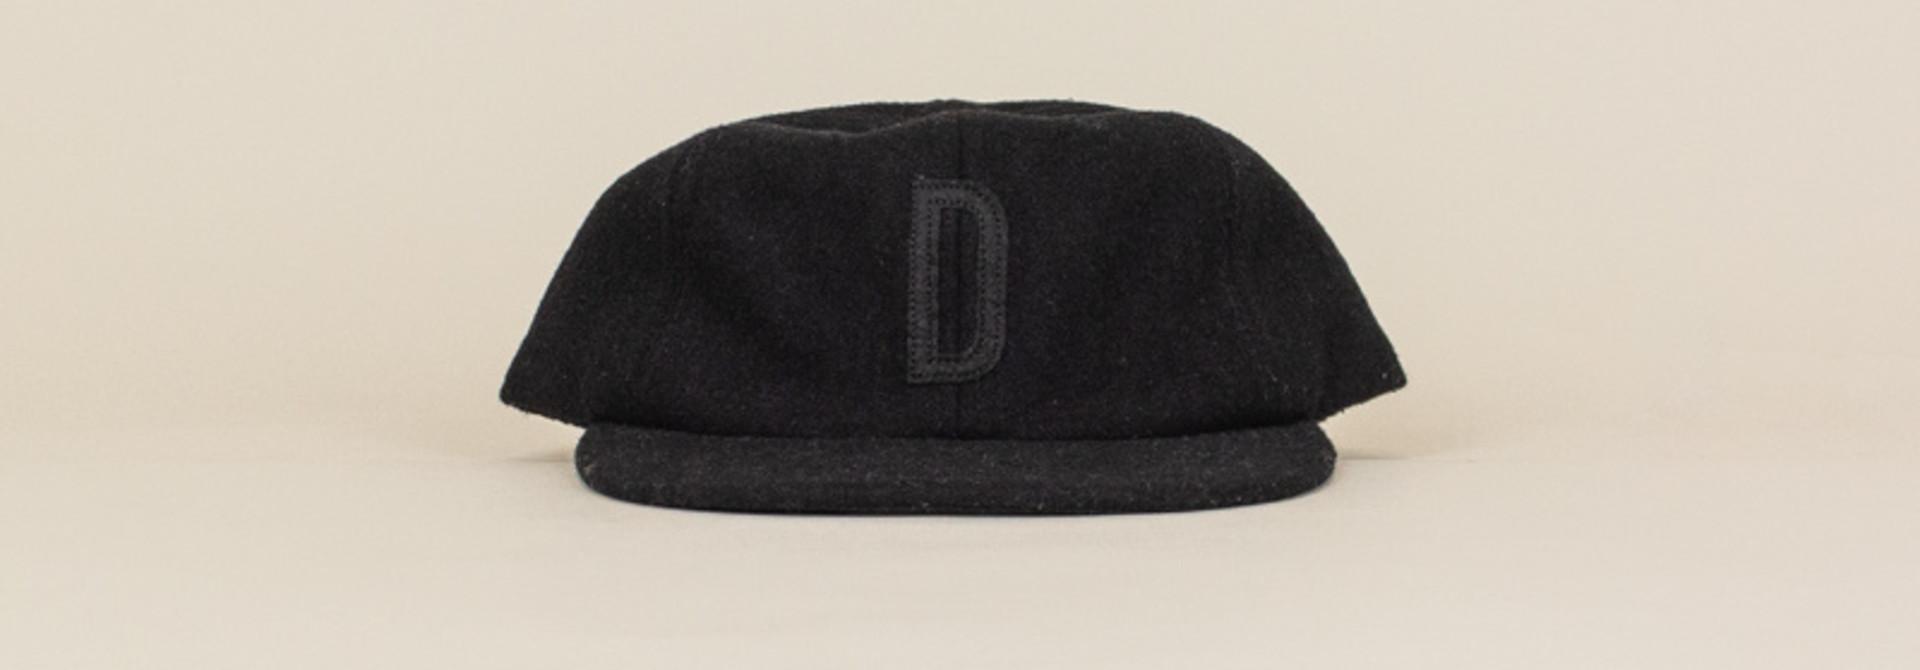 Diamond Supply Home Team Hat - Black